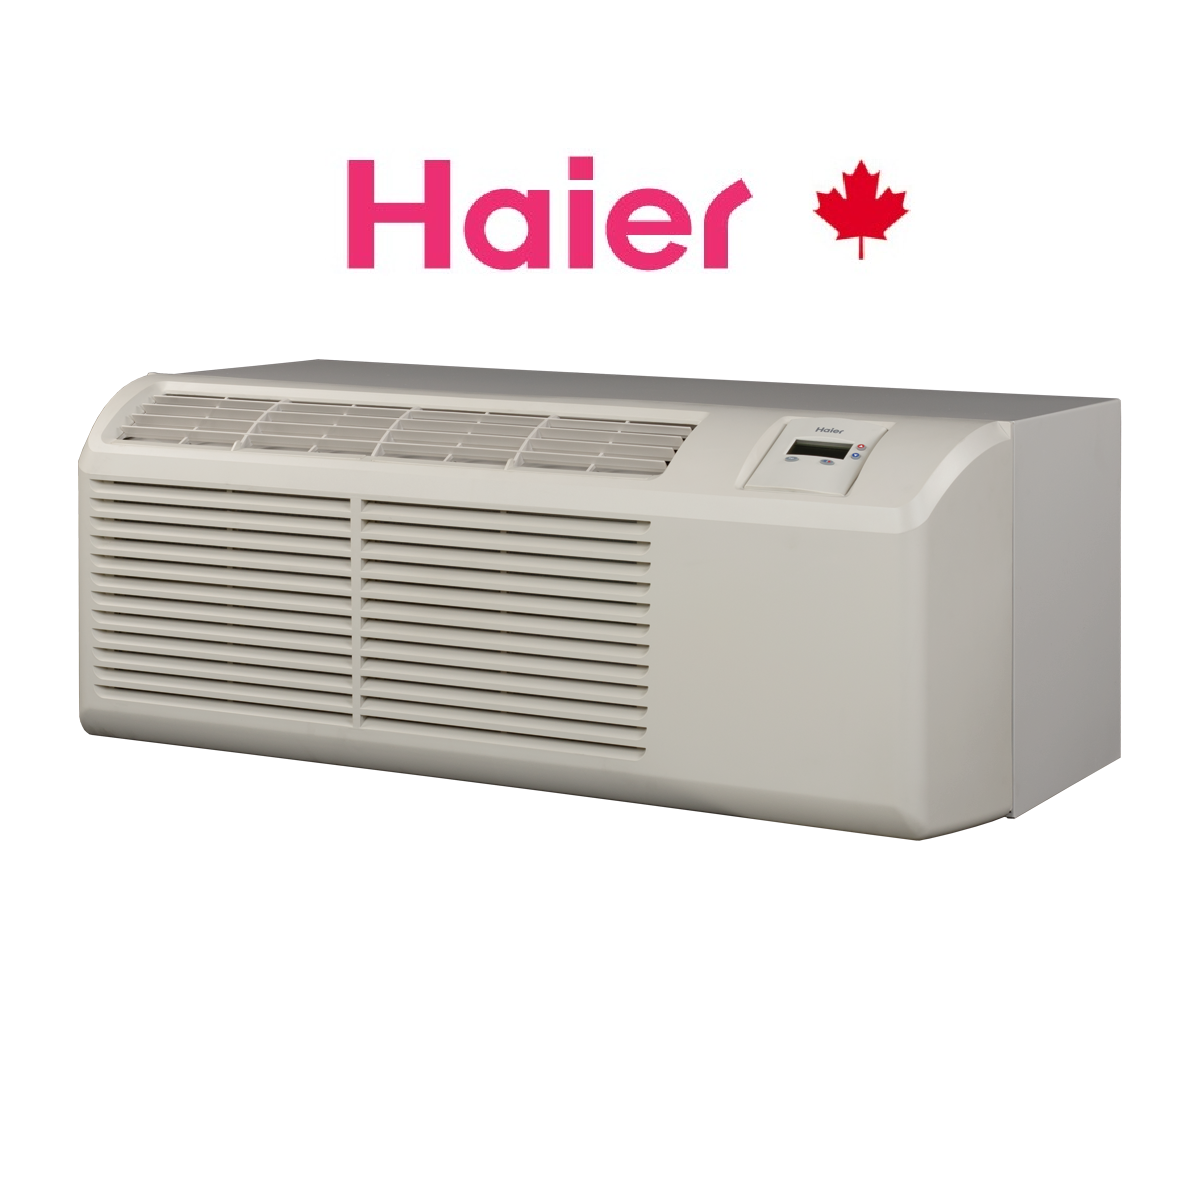 Haier PTCH151UAC 15000 btu PTAC Unit with Electric Heat